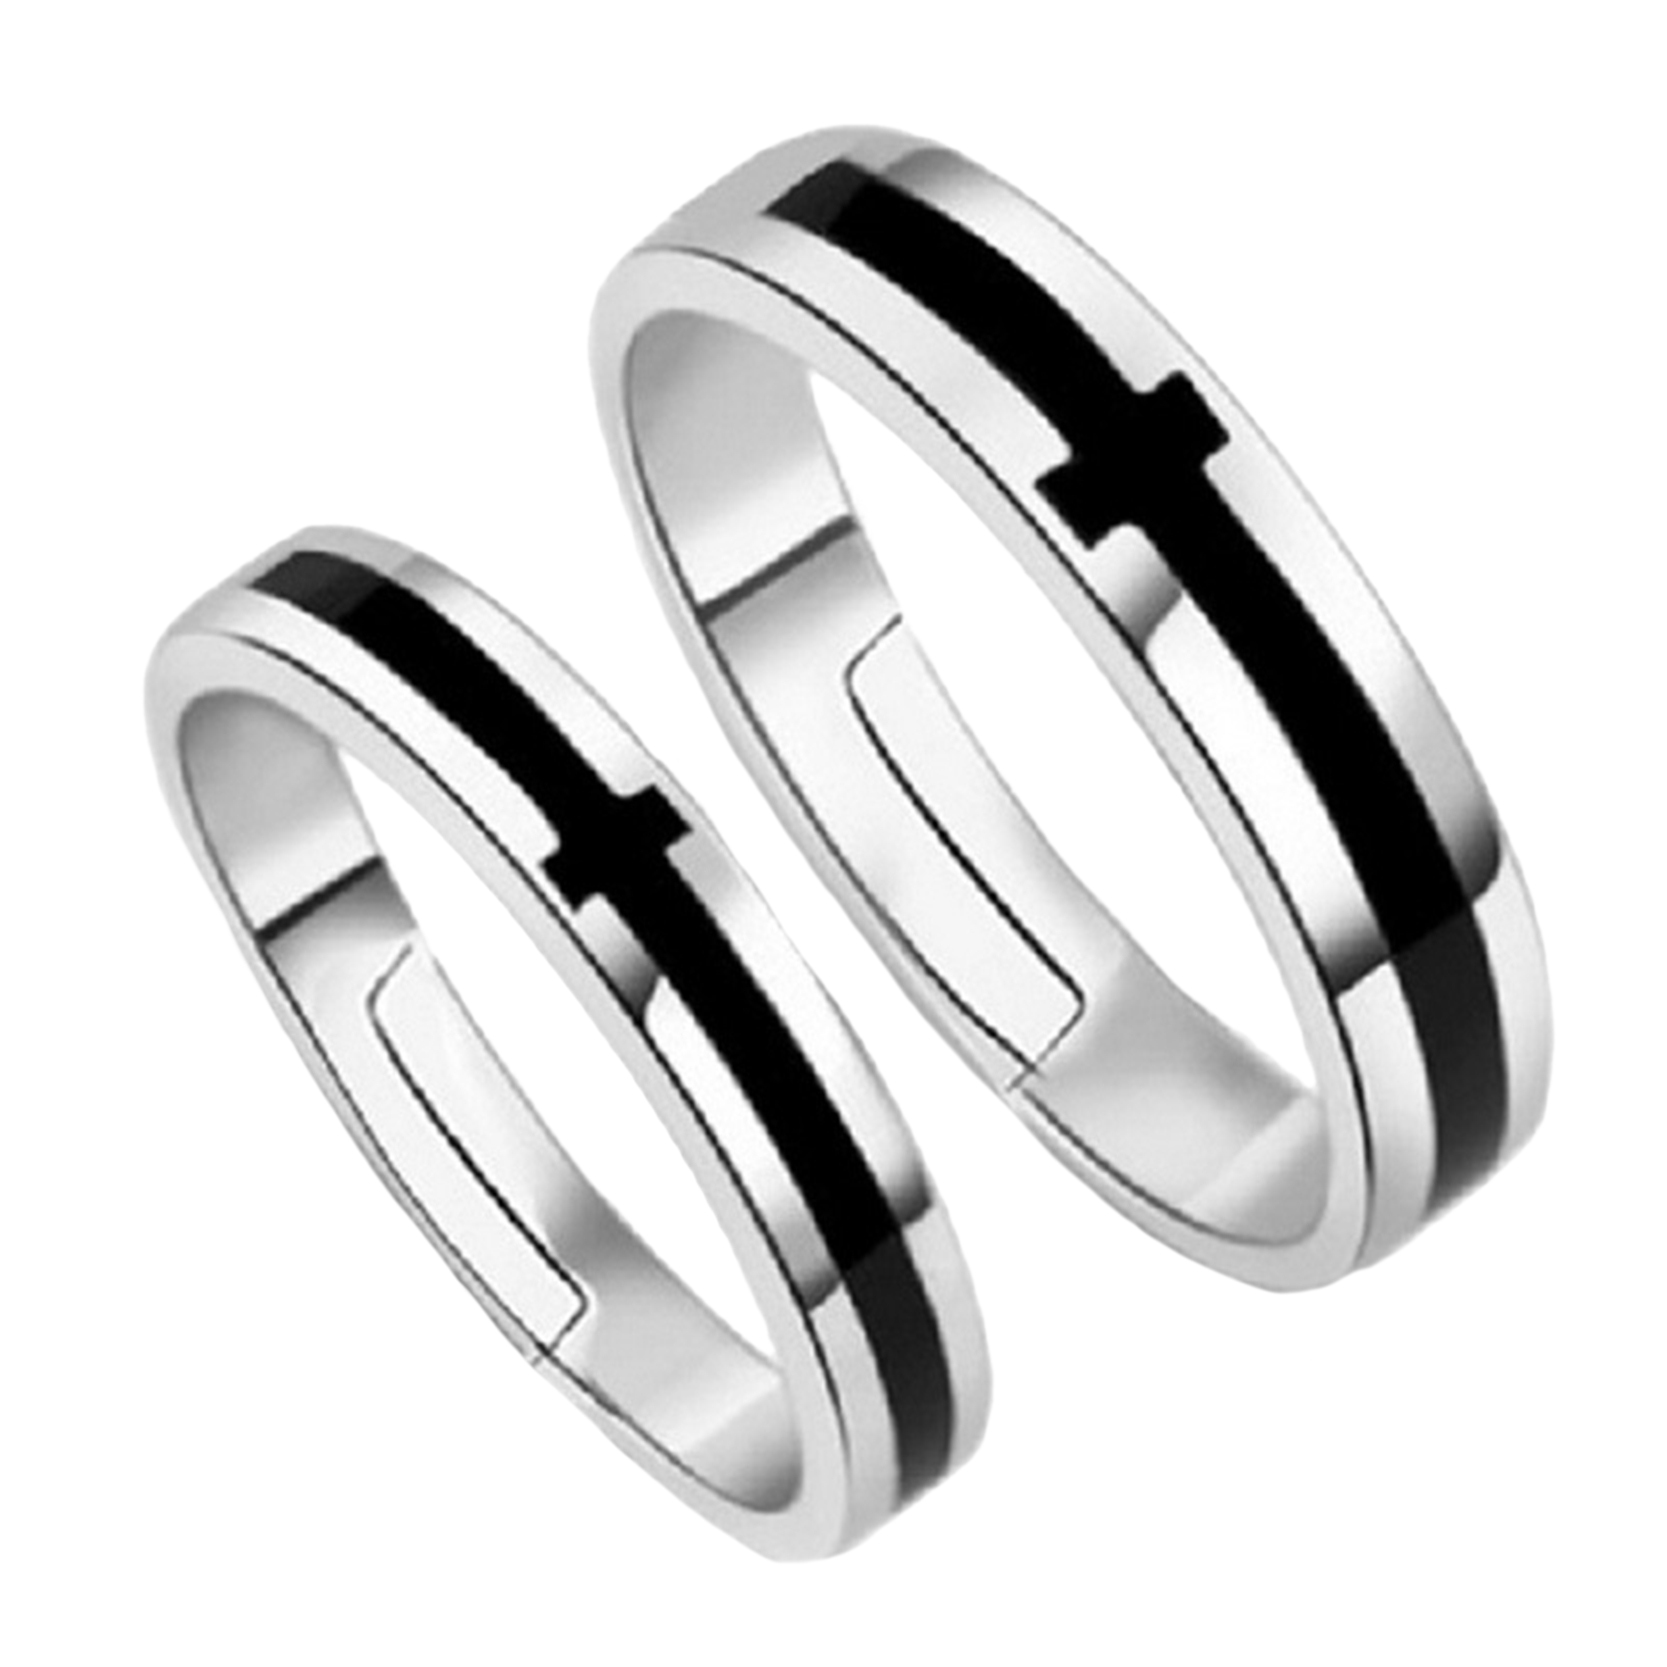 Inspirational Interlocking Wedding Rings Wedding